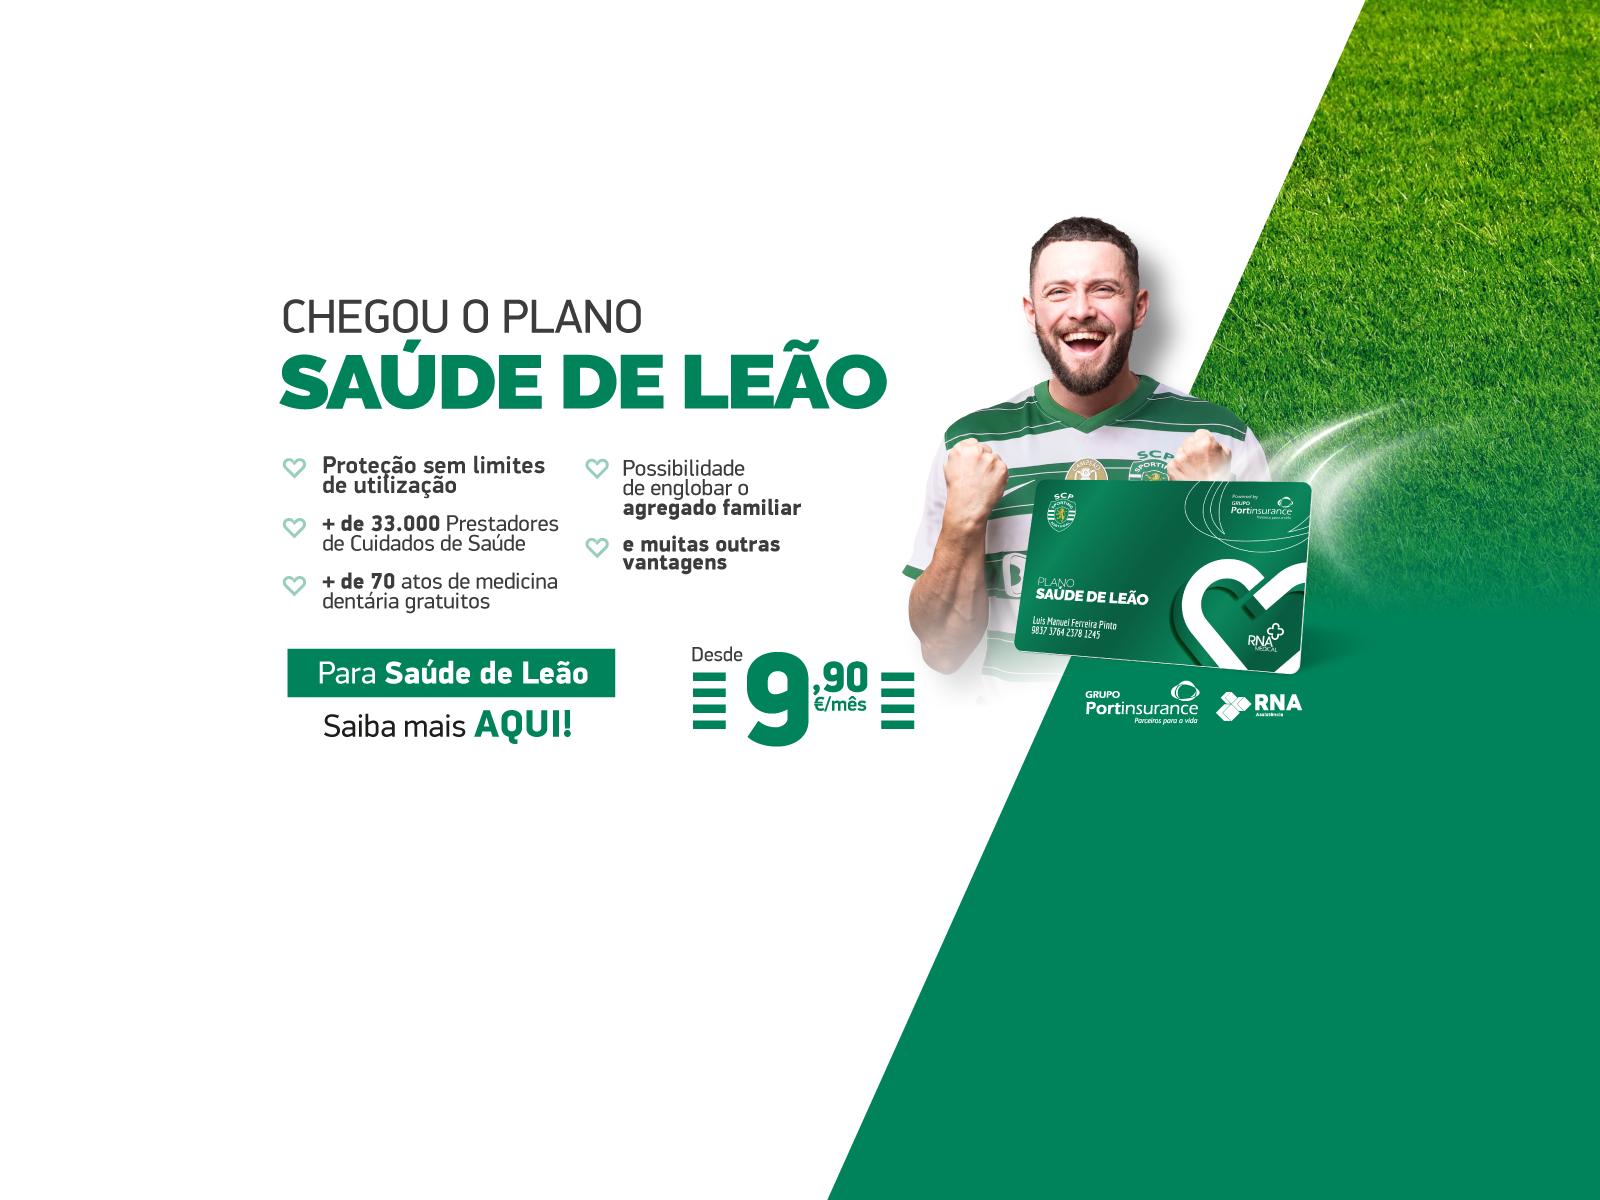 https://scpconteudos.pt/sites/default/files/revslider/image/Sporting_Saude_de_Leao_SCP_banner_homepage_v23jul_12h33m-01.png